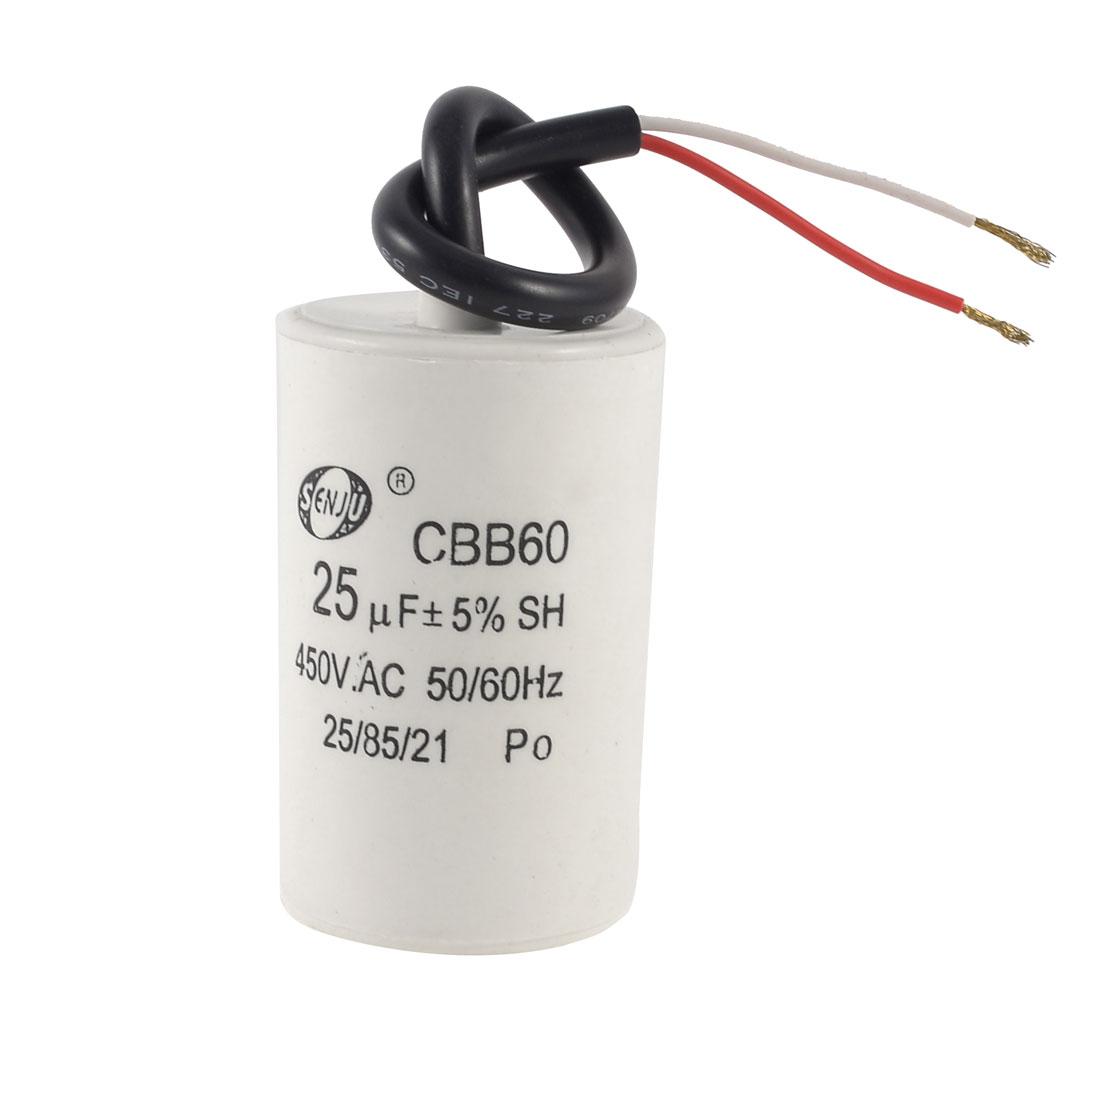 CBB60 Nonpolar Motor Running Capacitor 450VAC 25uF 5% for Washing Machine